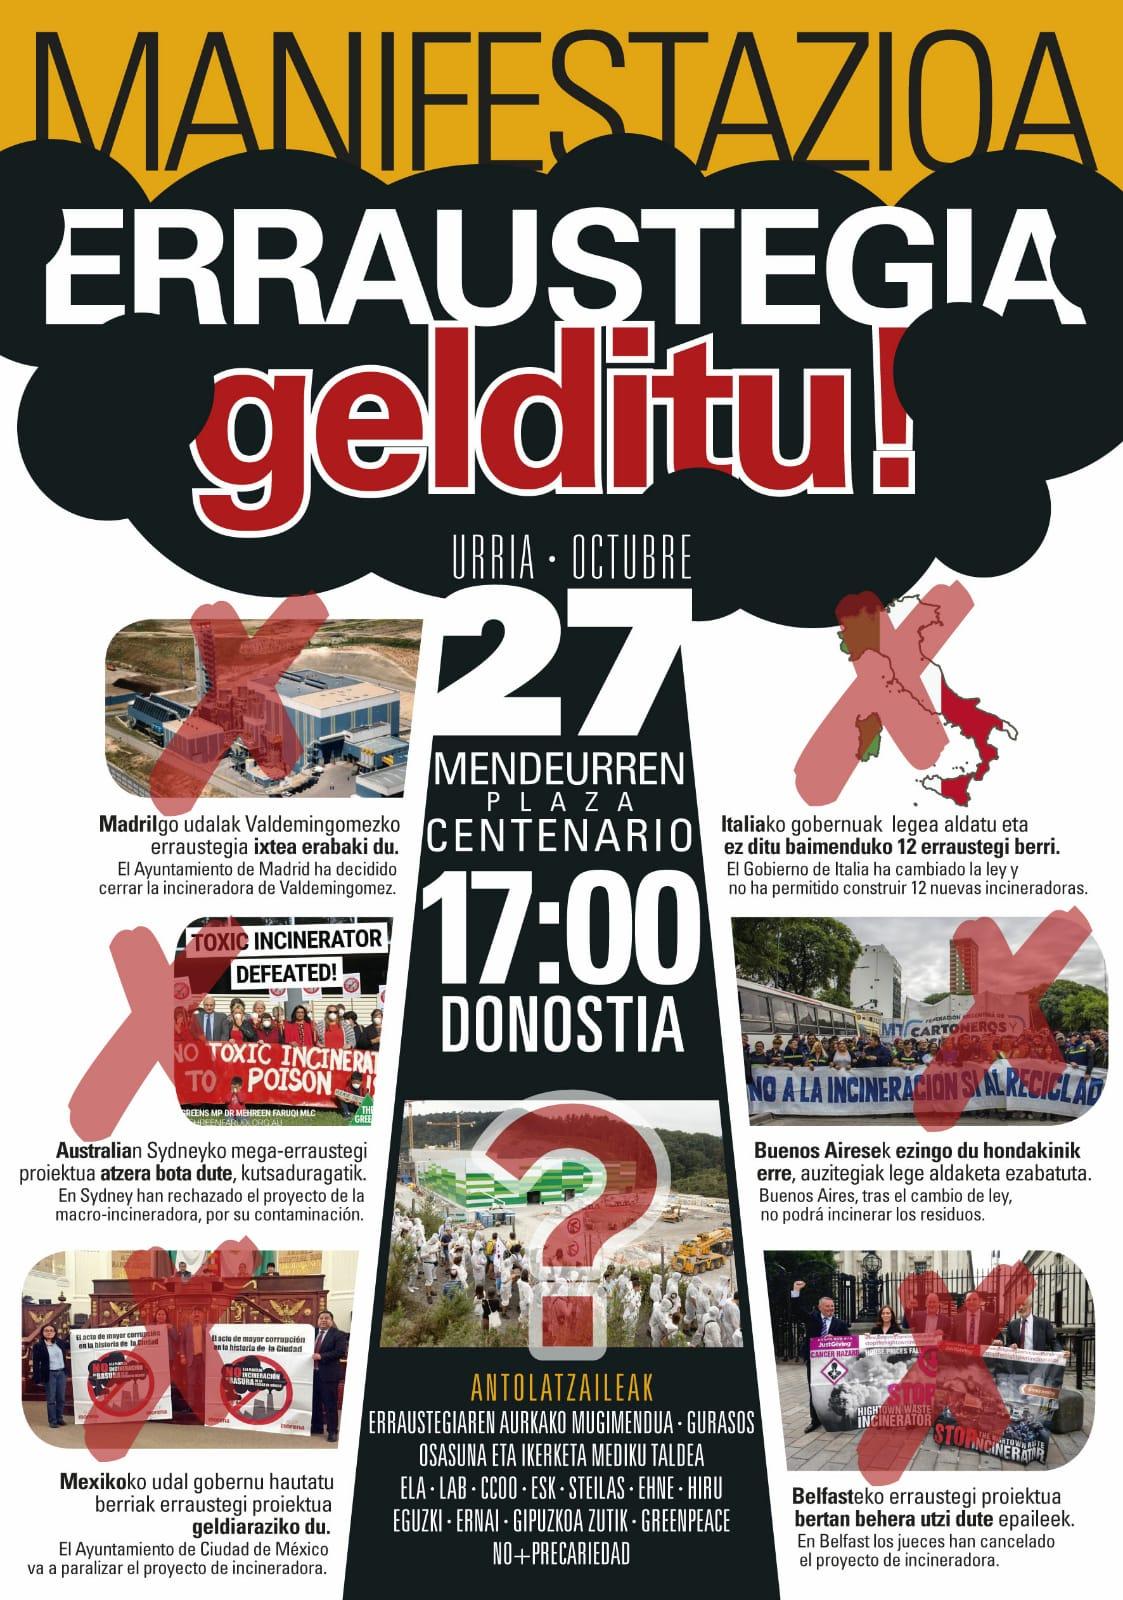 Organizado por varios agentes sociales de Gipuzkoa, el 27 de octubre manifestación en Donostia: «Erraustegia gelditu!»